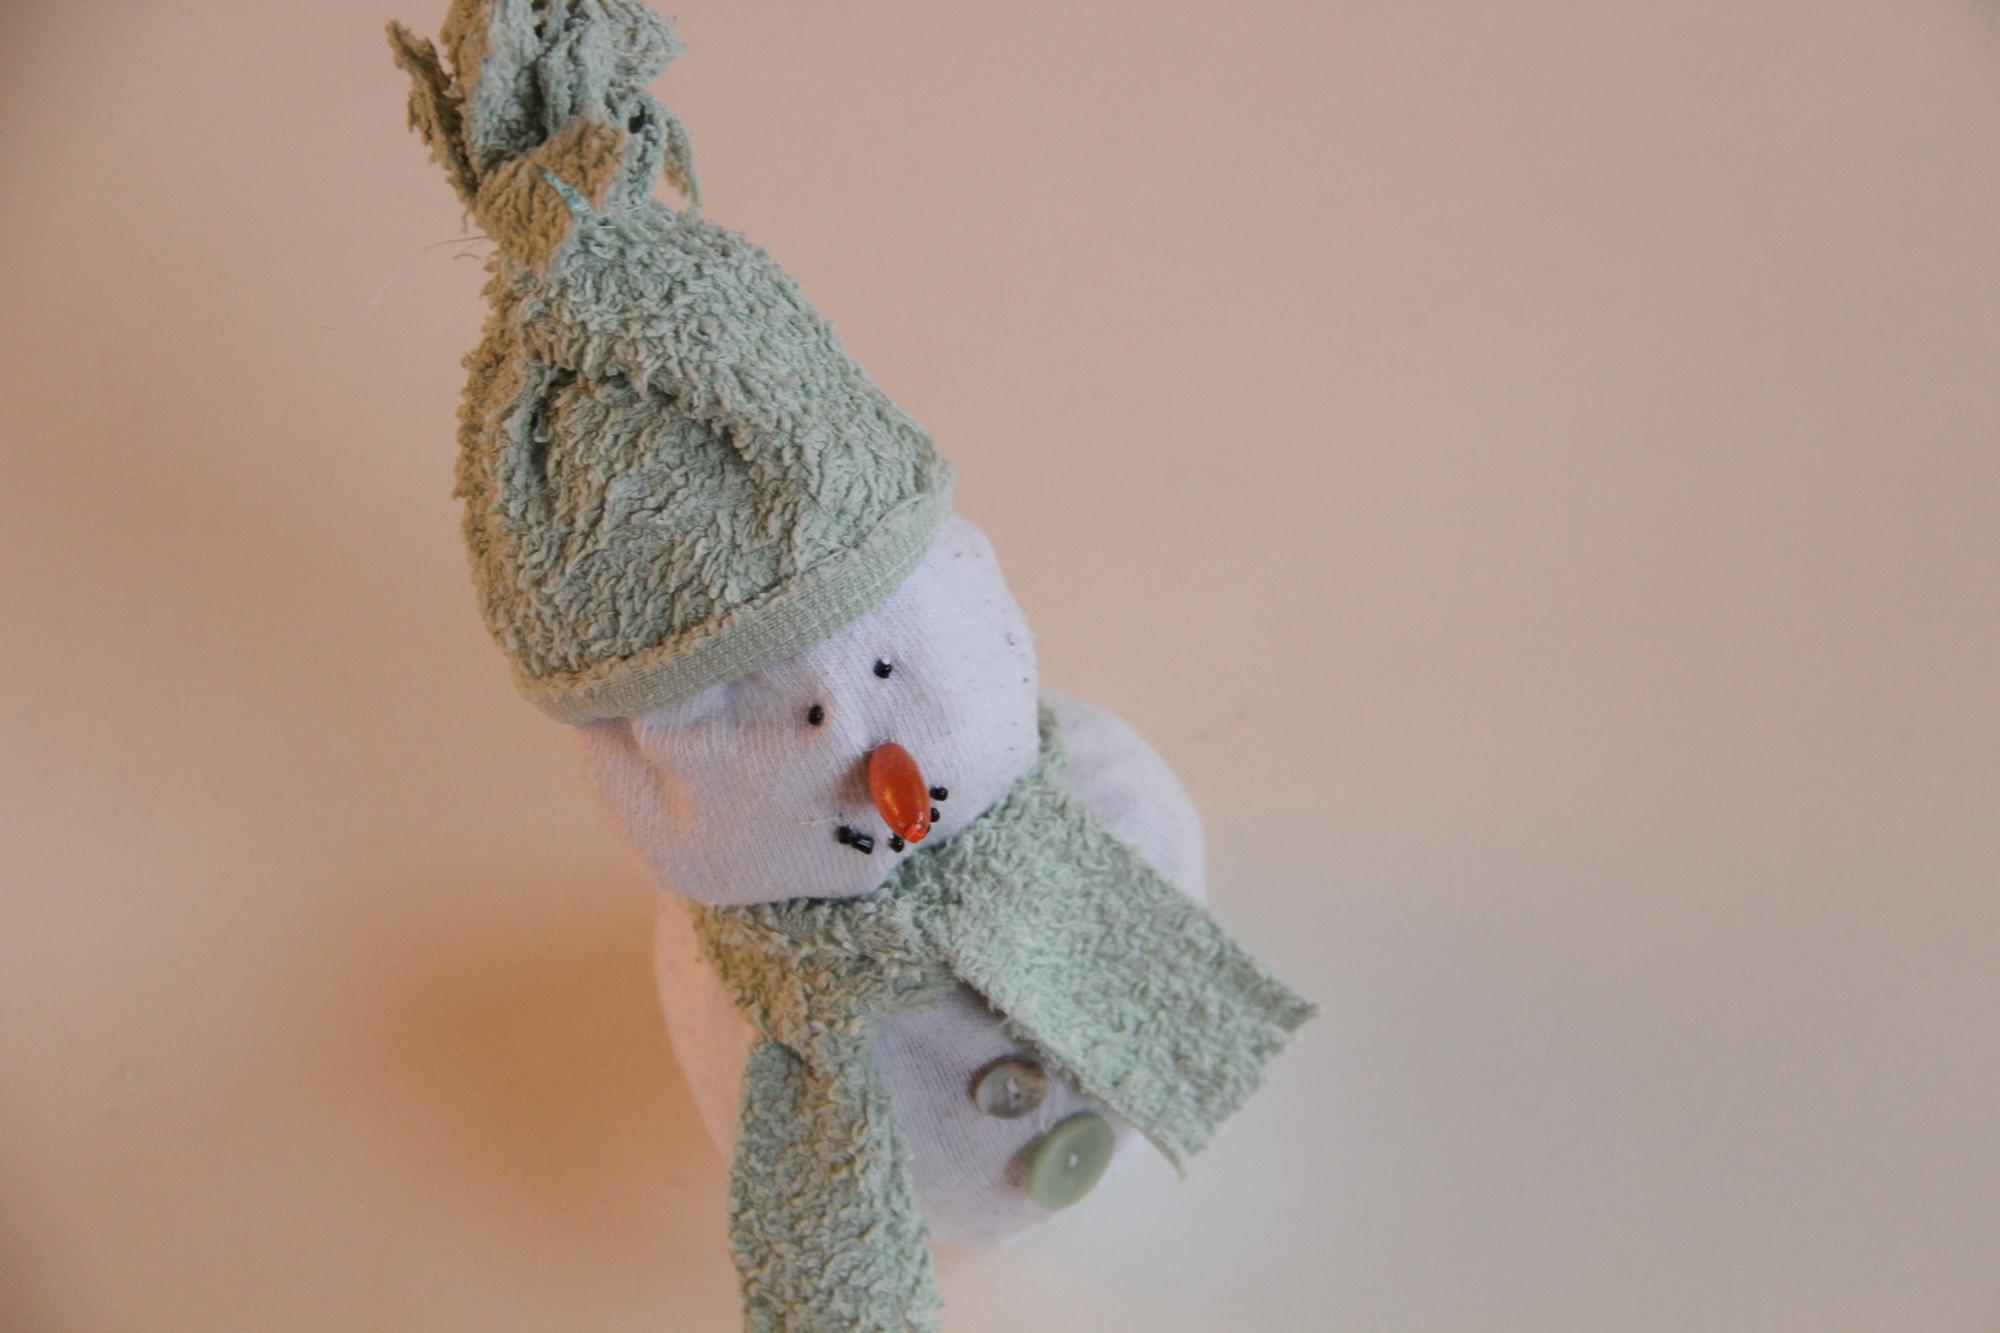 Socken Upcycling: Kuscheliger Schneemann